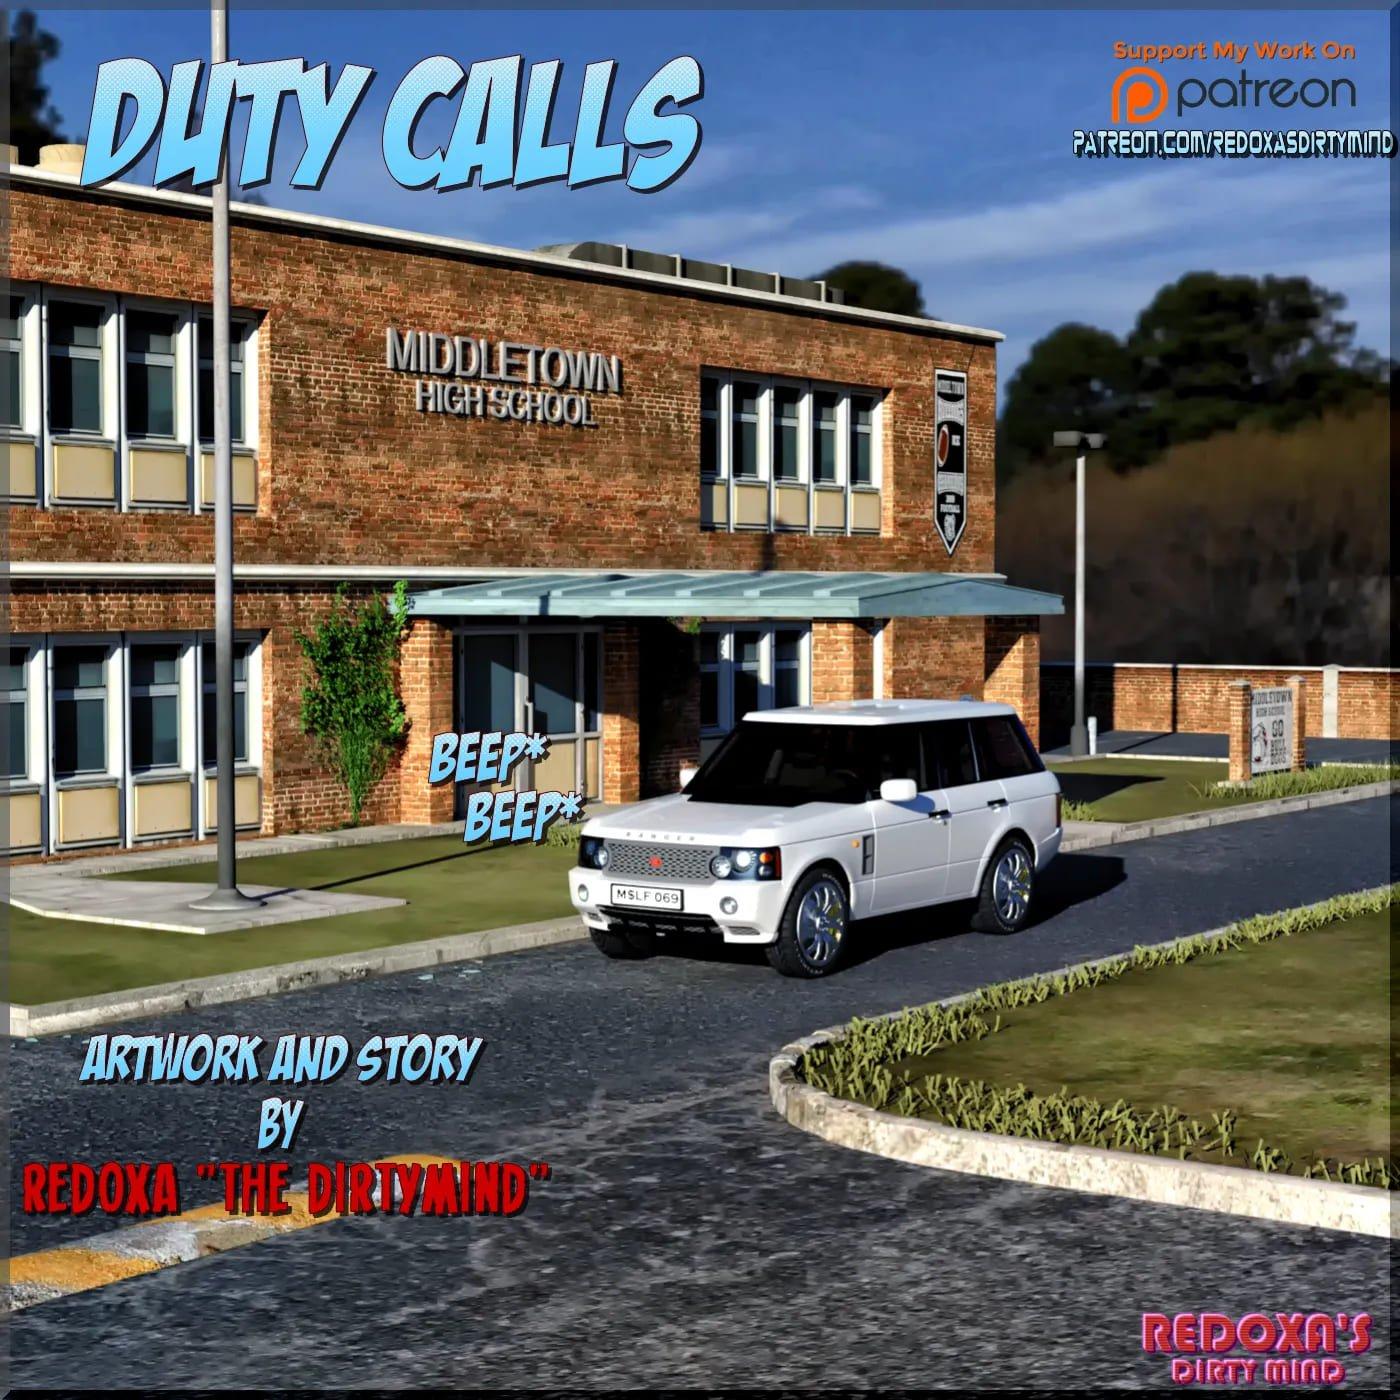 DUTY CALLS parte 2